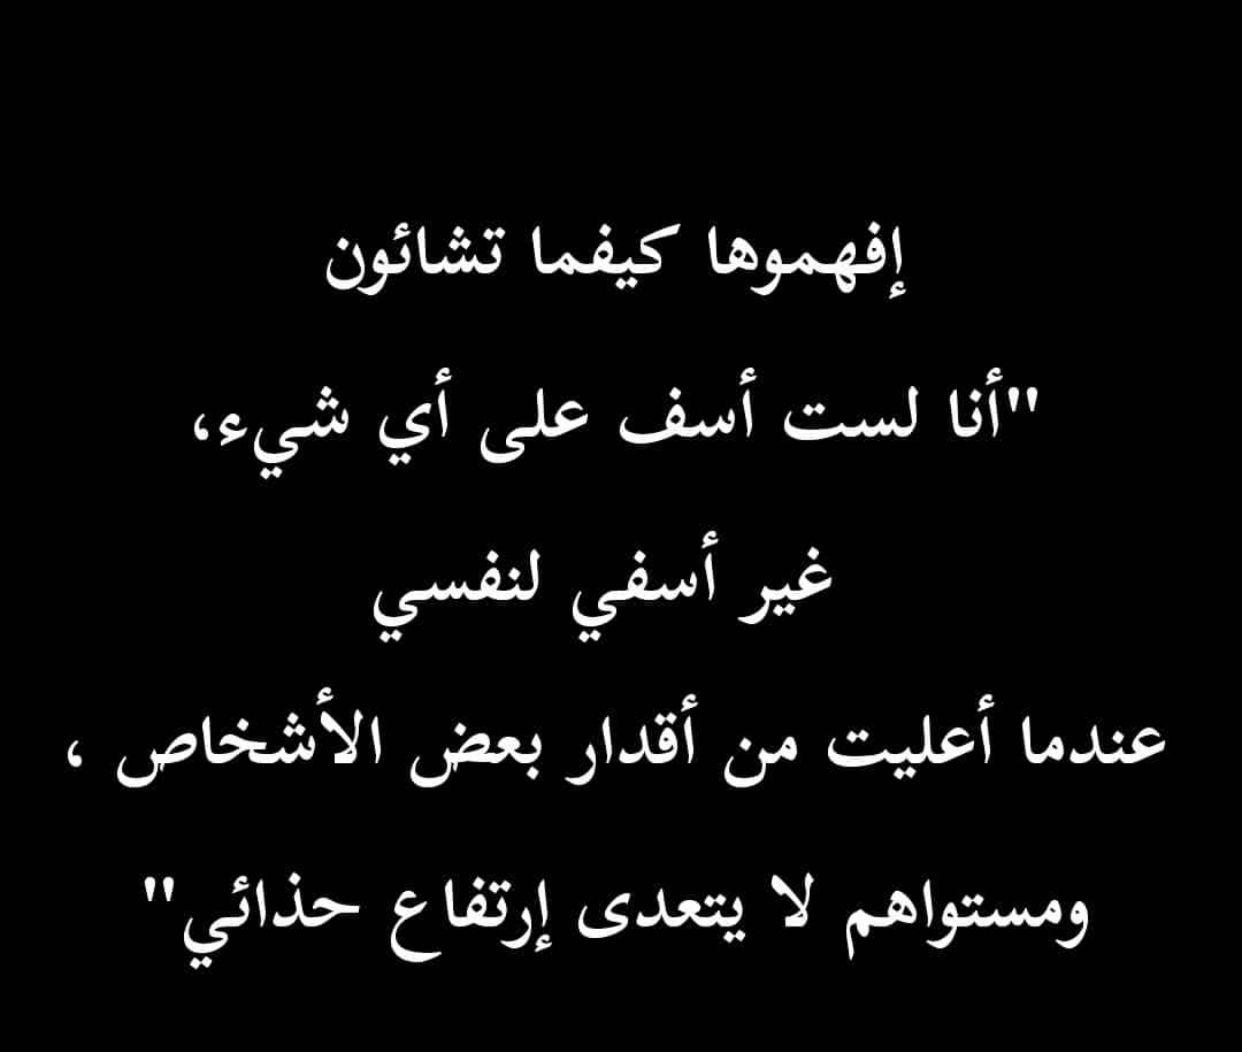 افهموها كيفما تشائون Arabic Calligraphy